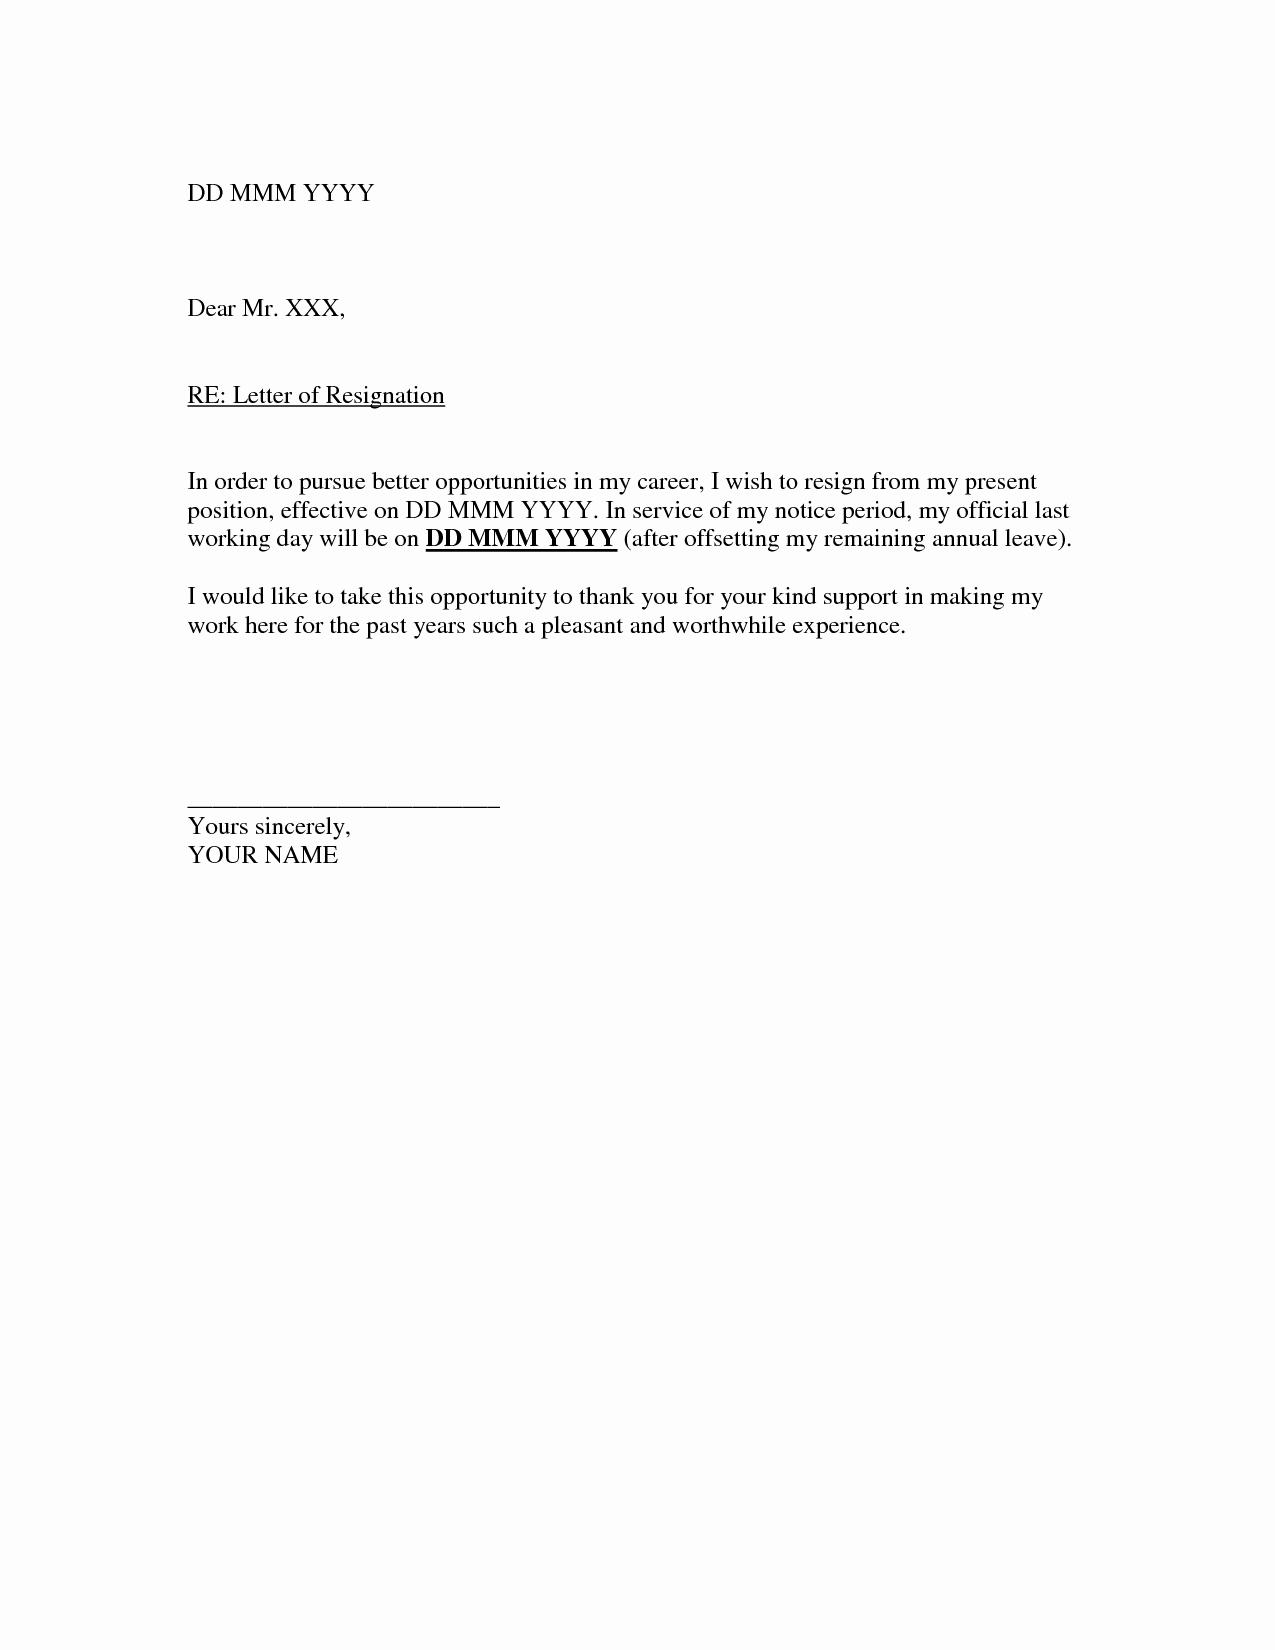 Template for Letter Of Resignation Lovely How to Write Easy Simple Resignation Letter Sample